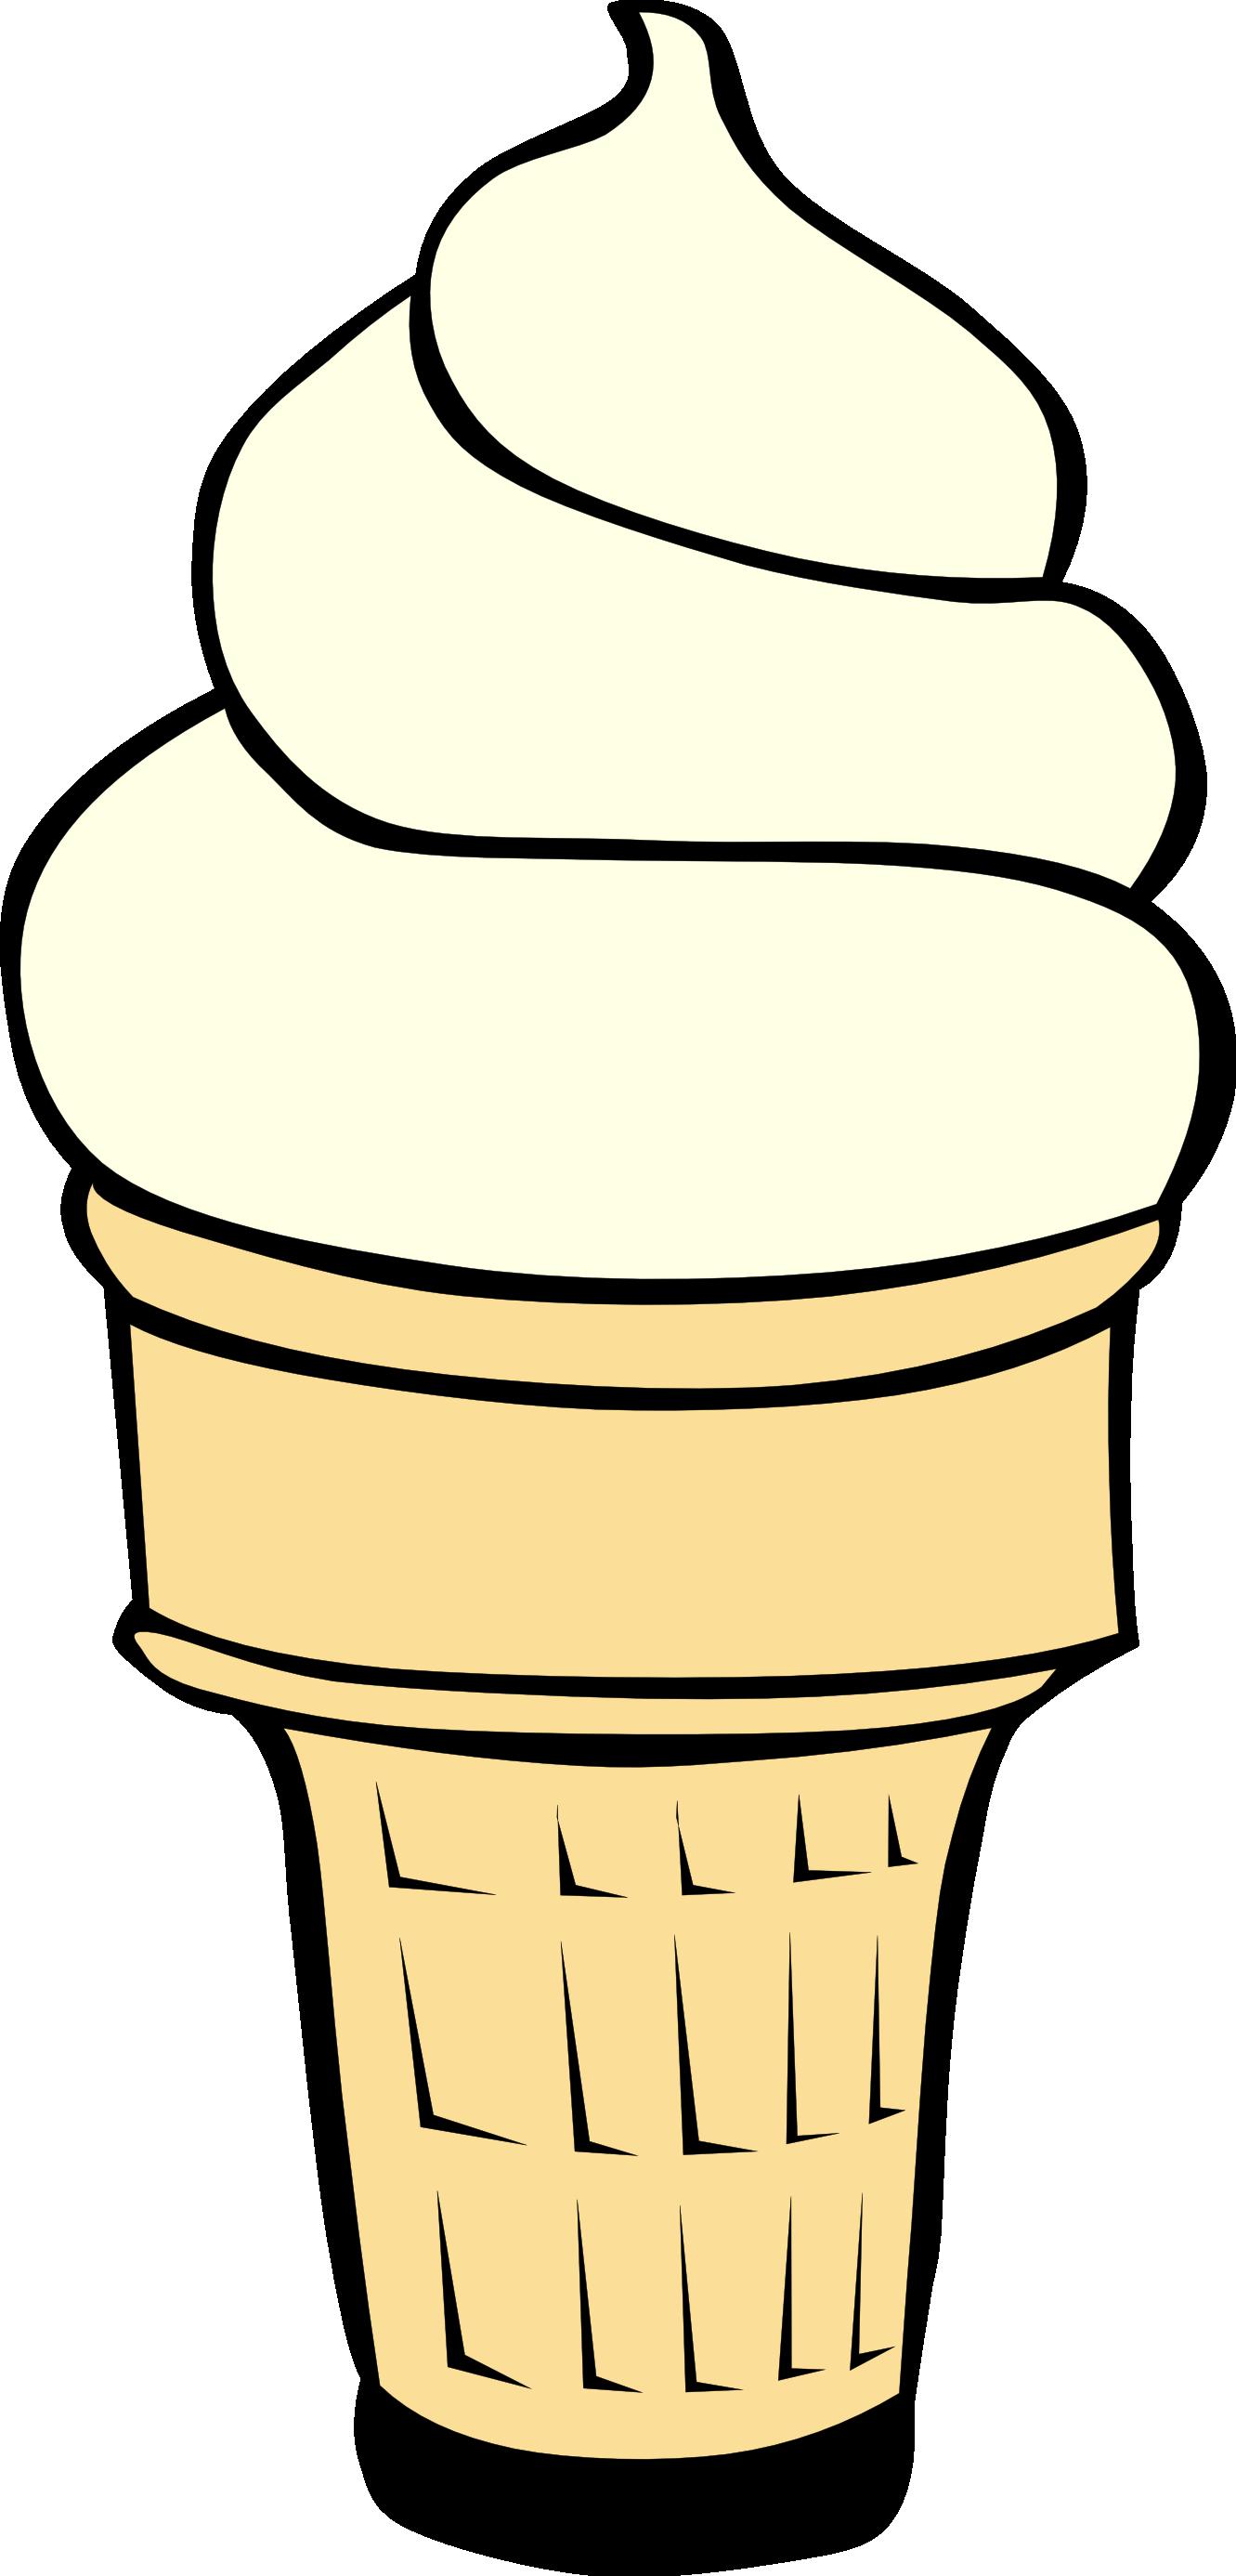 Ice Cream Clipart Black And White.